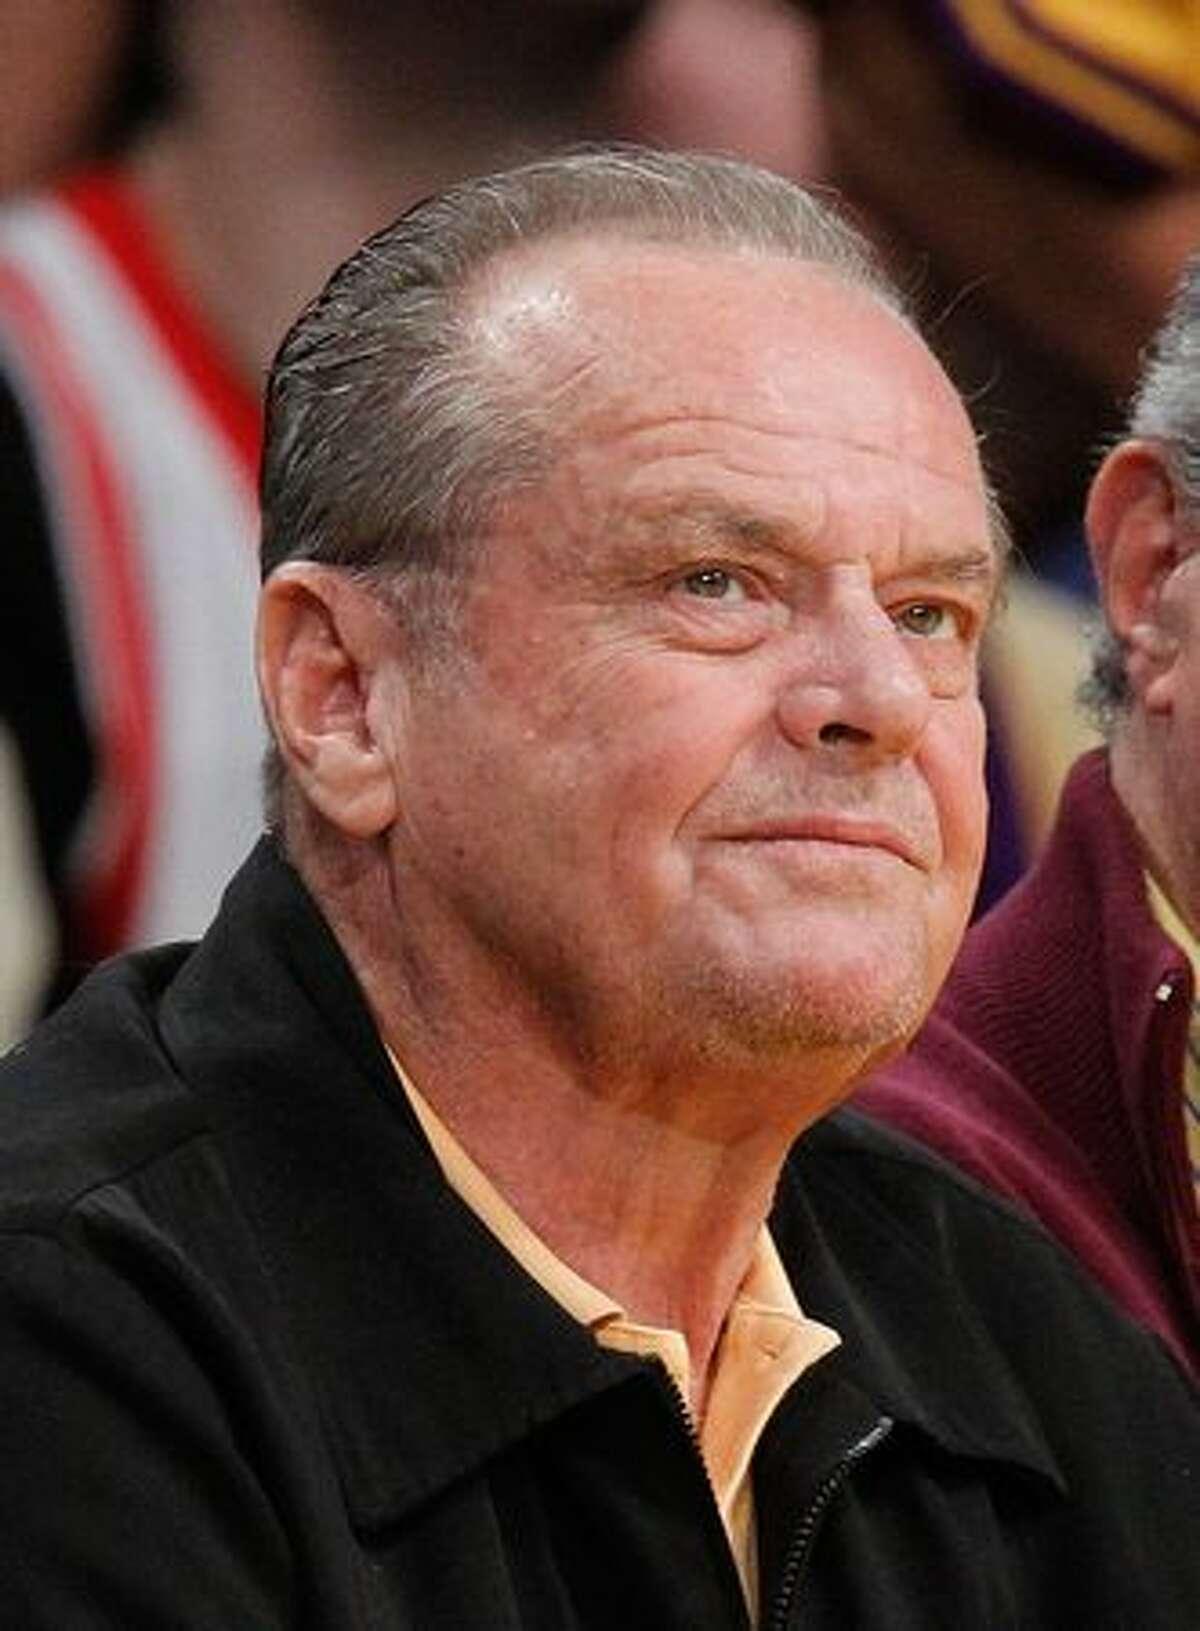 Jack Nicholson, May 19, 2010, age 73.